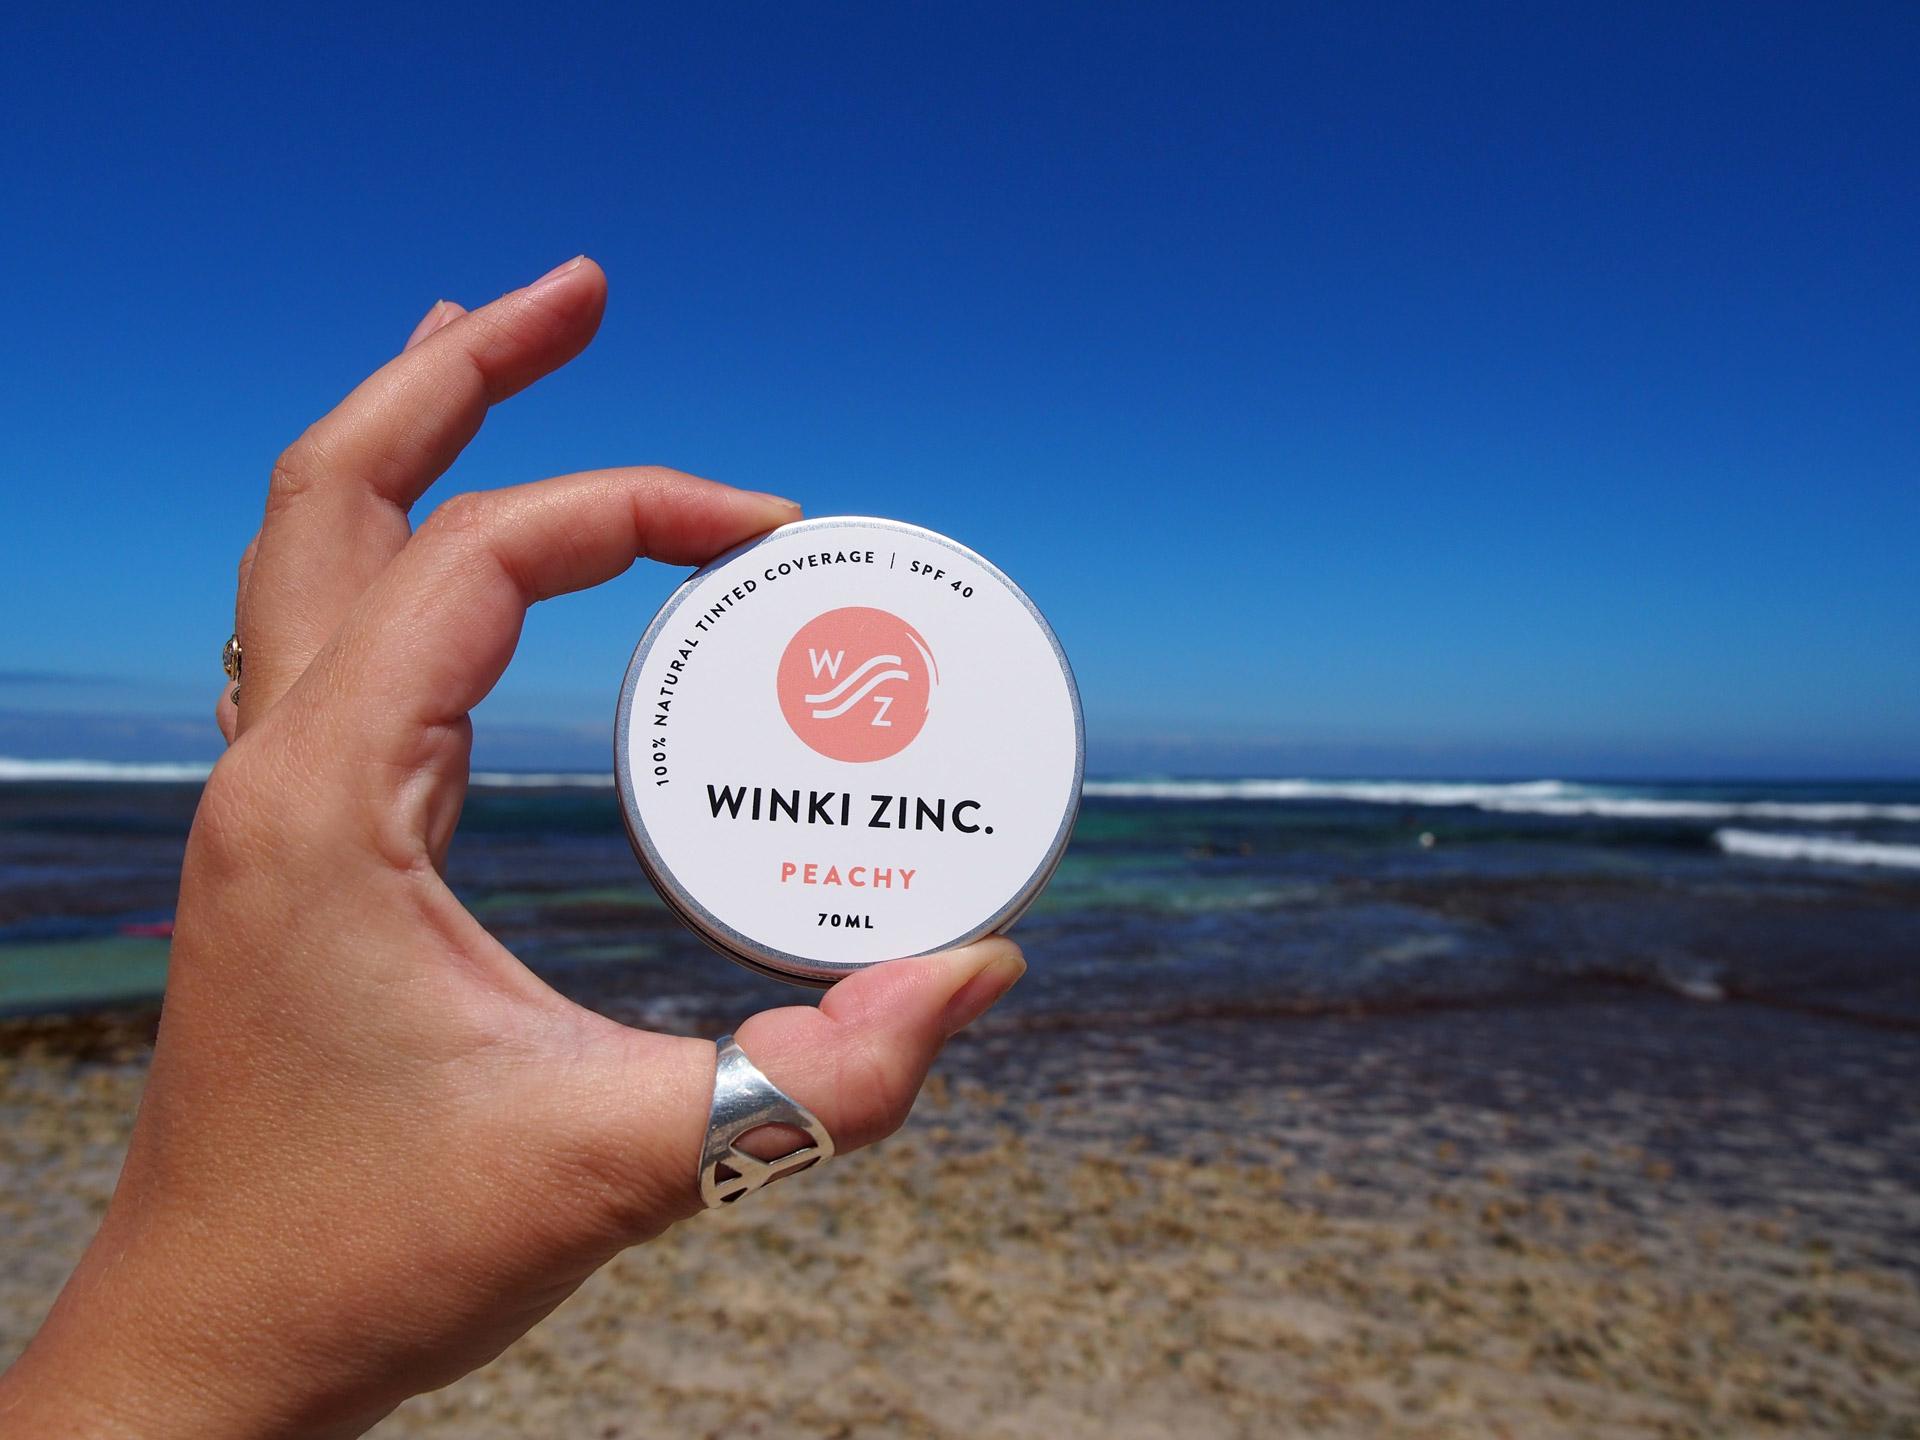 Winki-Zinc-Brand-Identity-logo-Design-Branding-Packaging-Studio-Mimi-Moon-12